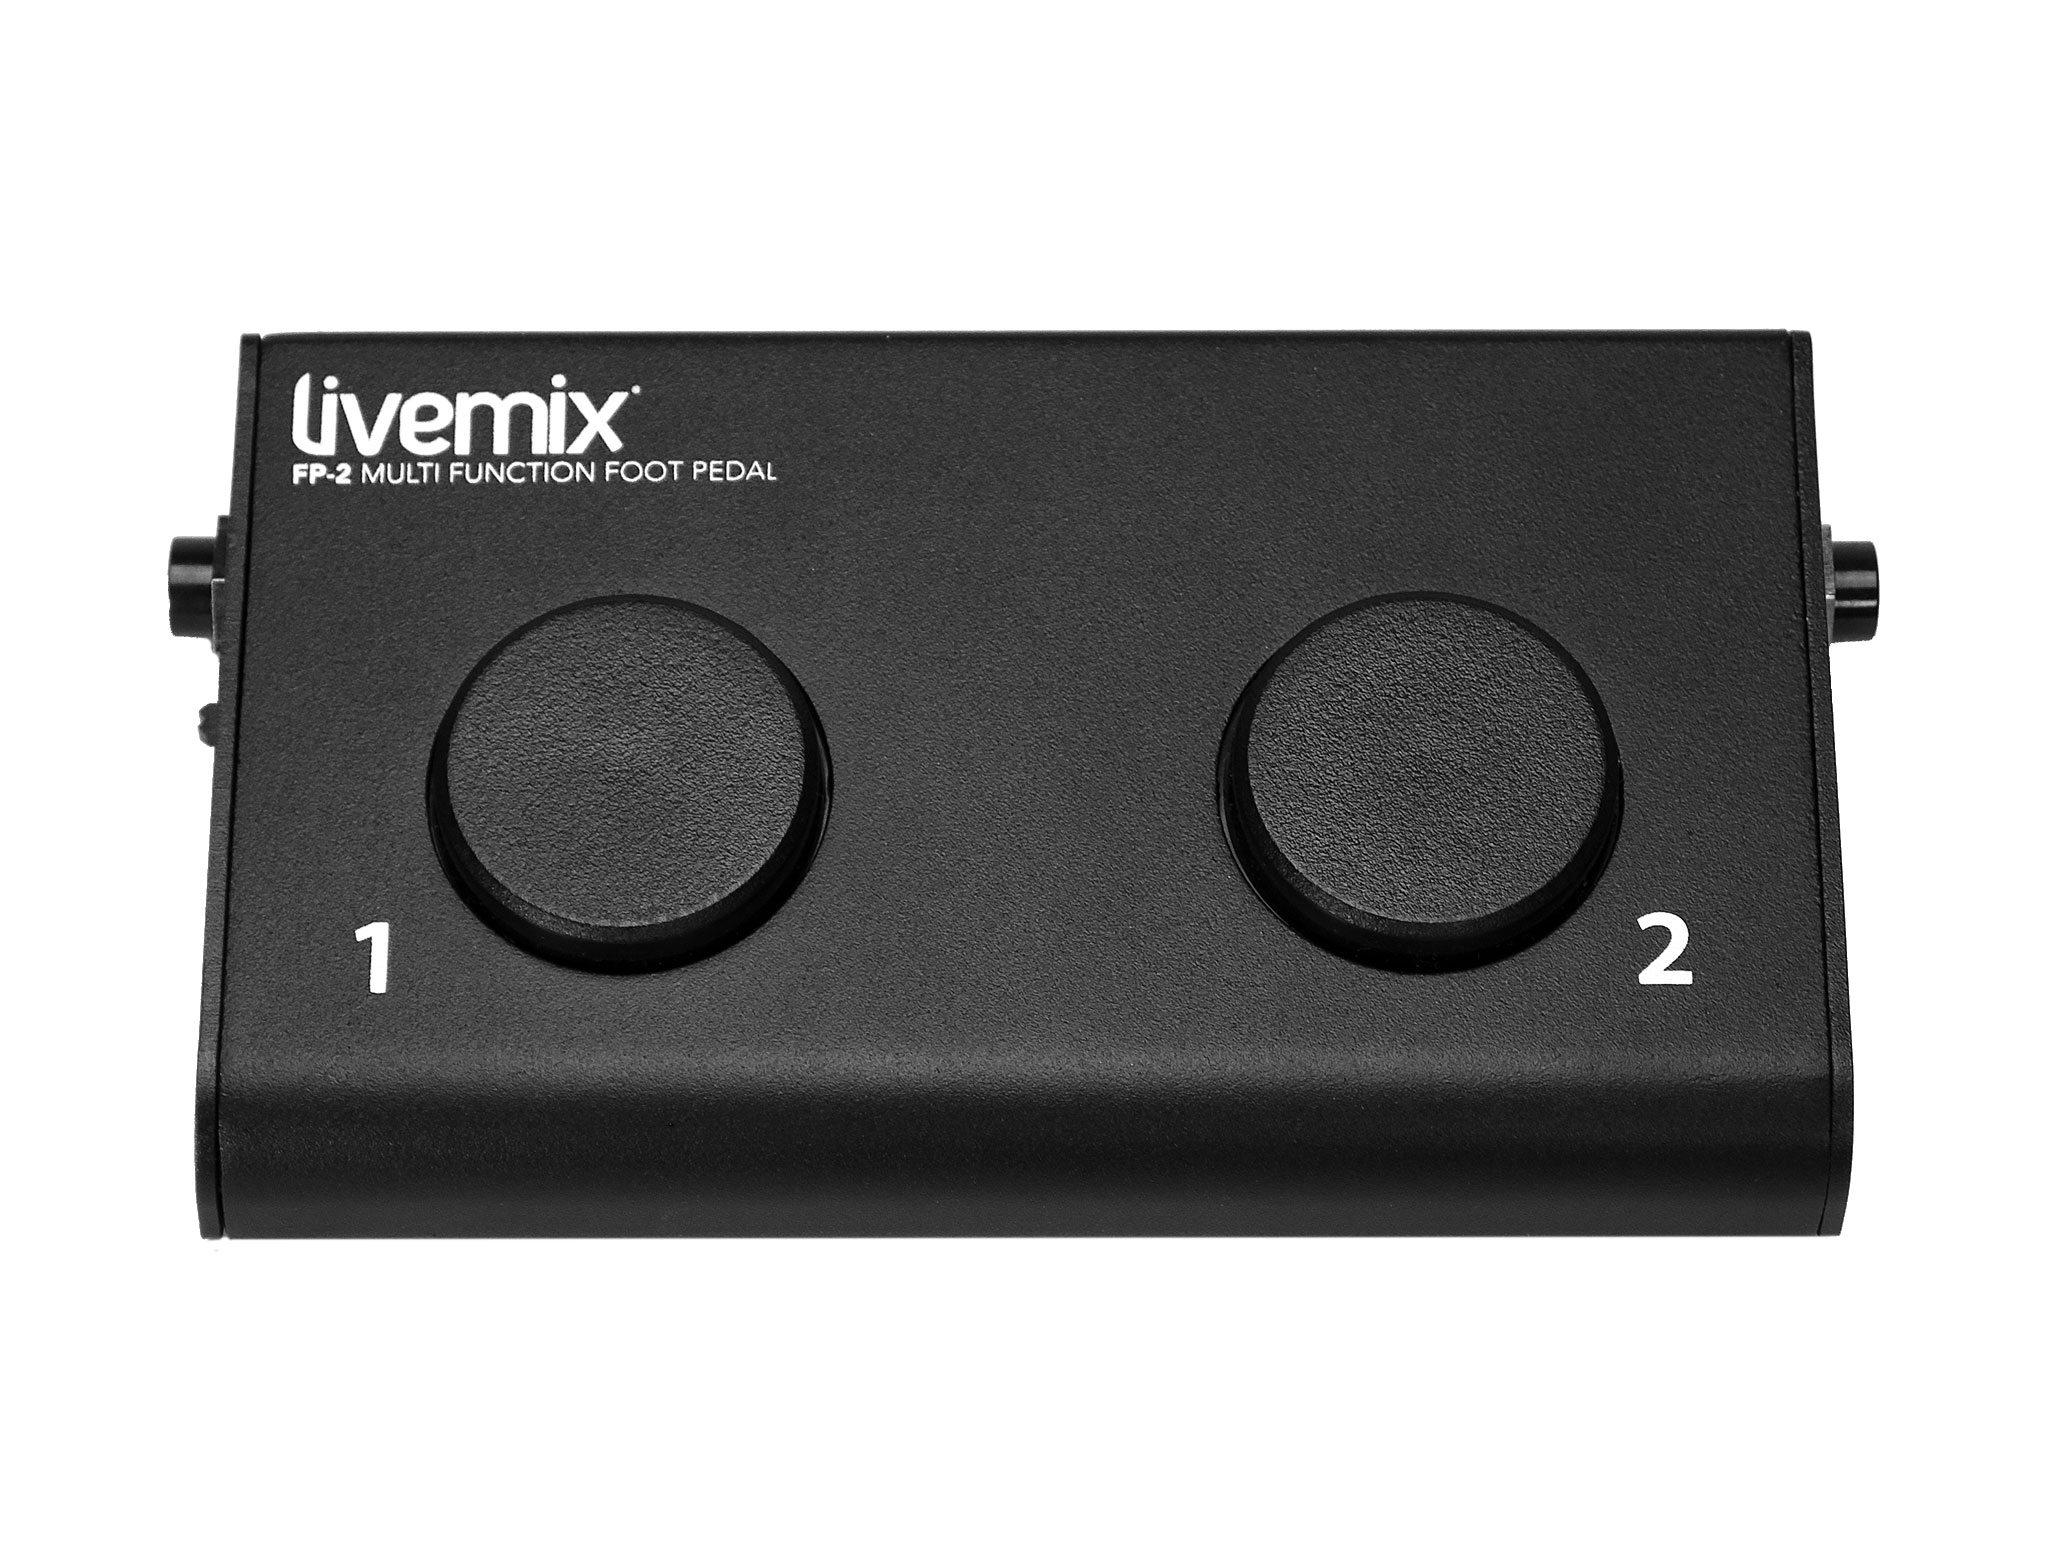 Livemix FP-2 hands free personal mix control top image